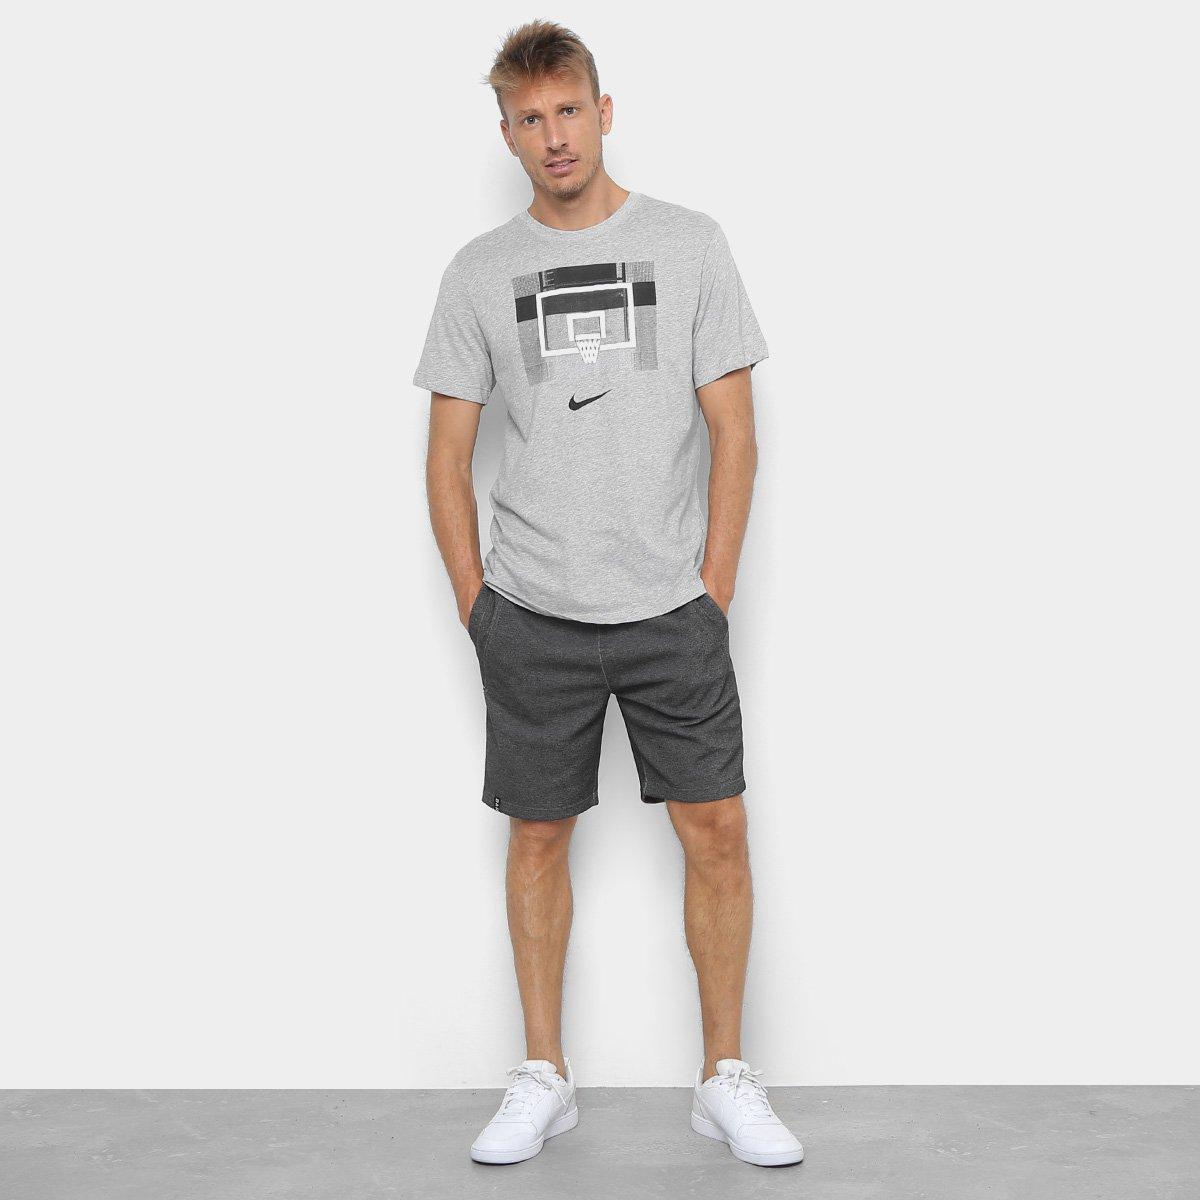 7f23588bea Camiseta Nike Dri-Fit Backboard Masculina - Tam: G - Shopping TudoAzul